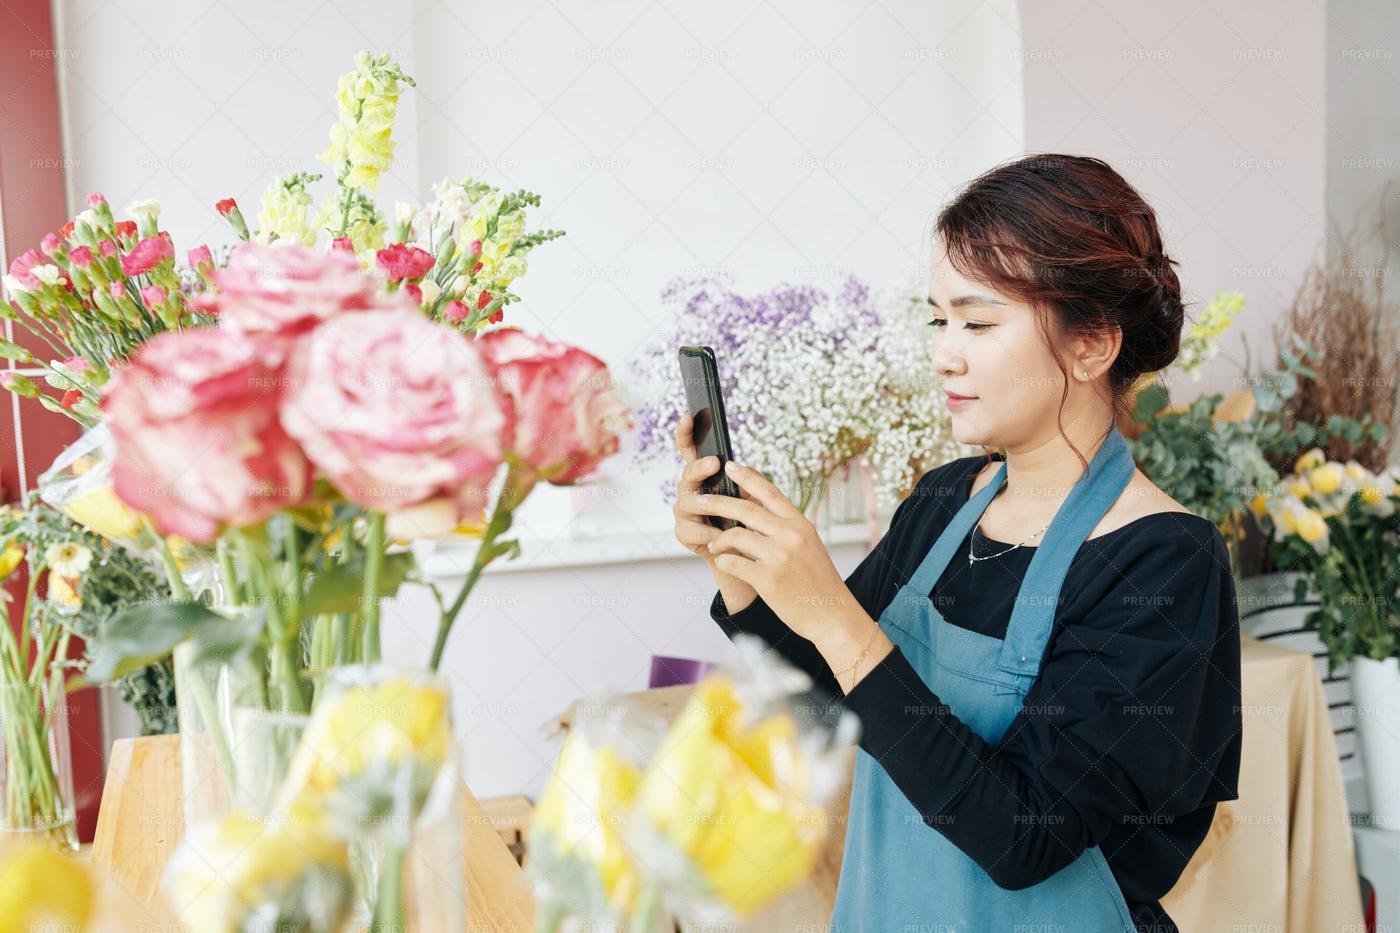 Florist Posting Photos Of Bouquets: Stock Photos